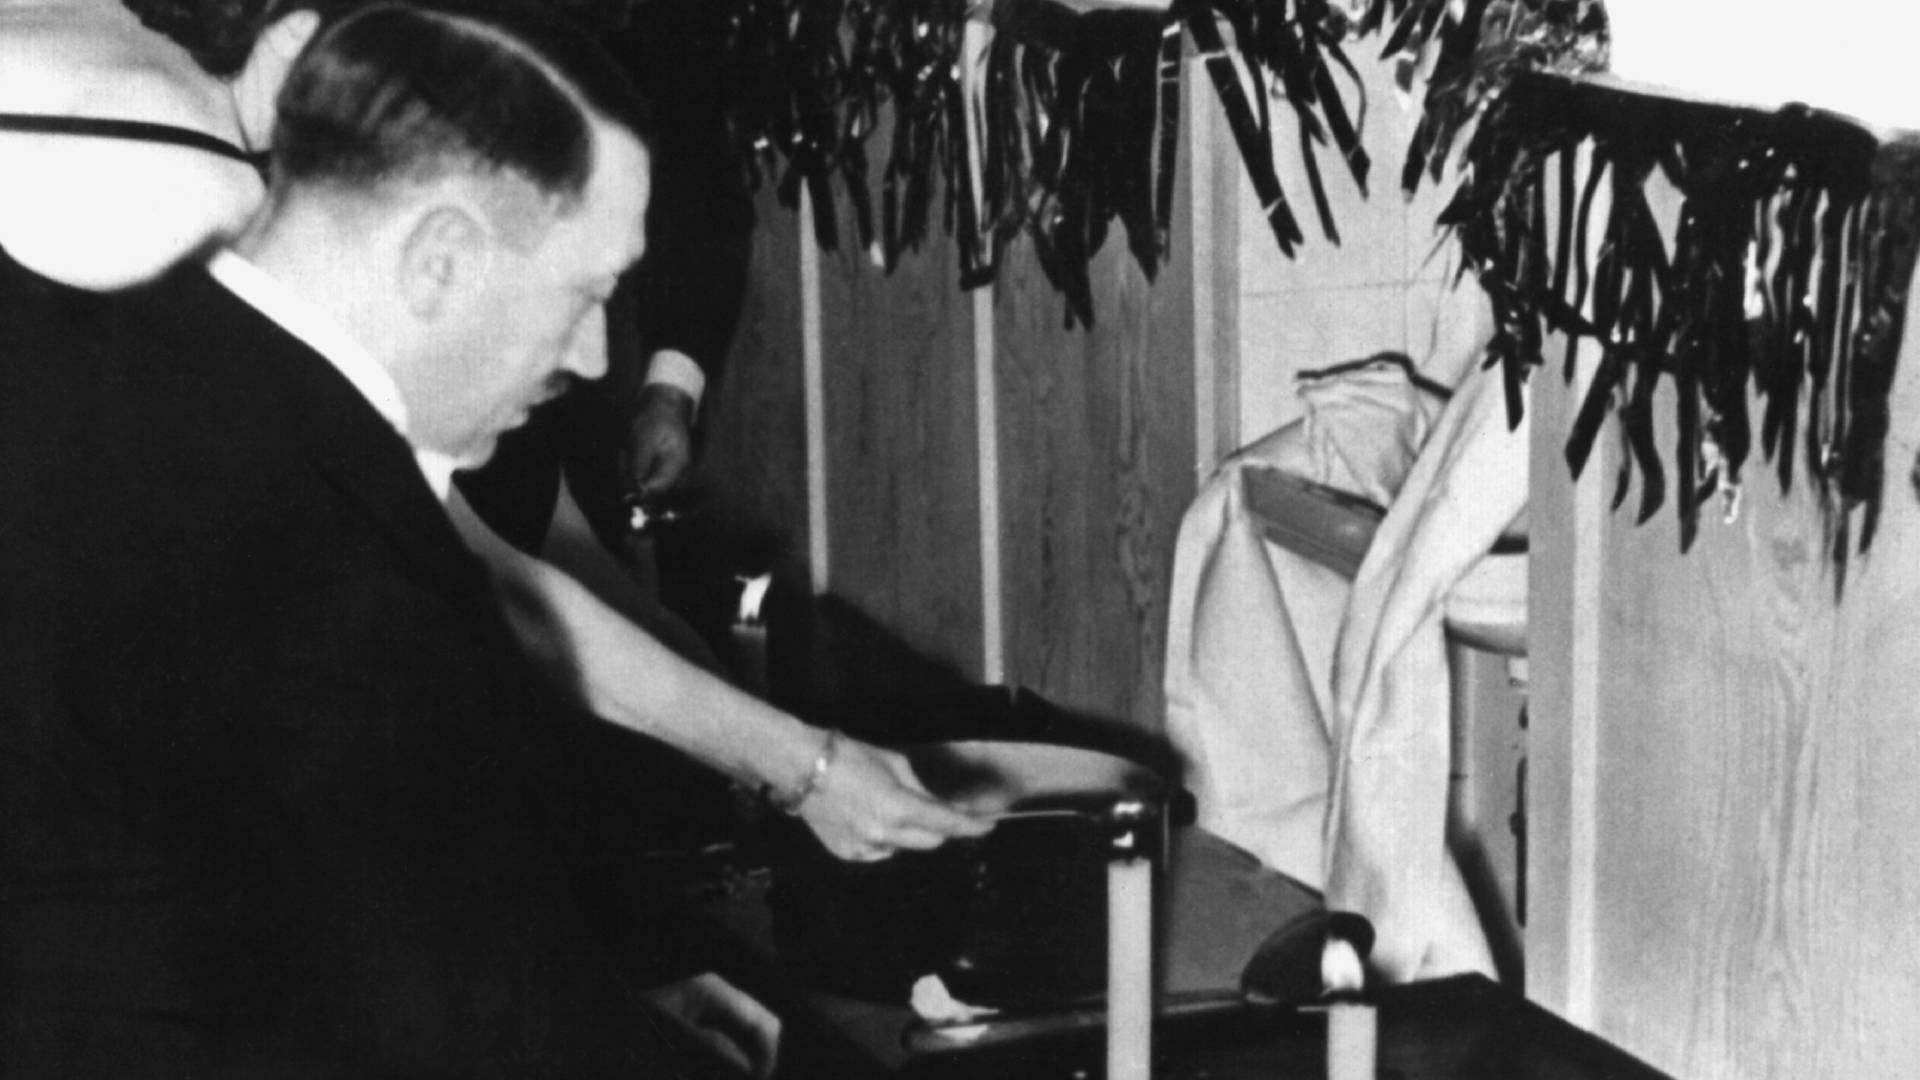 20 4 1940 Burger Schenken Hitler Kerzenhalter Zum Geburtstag